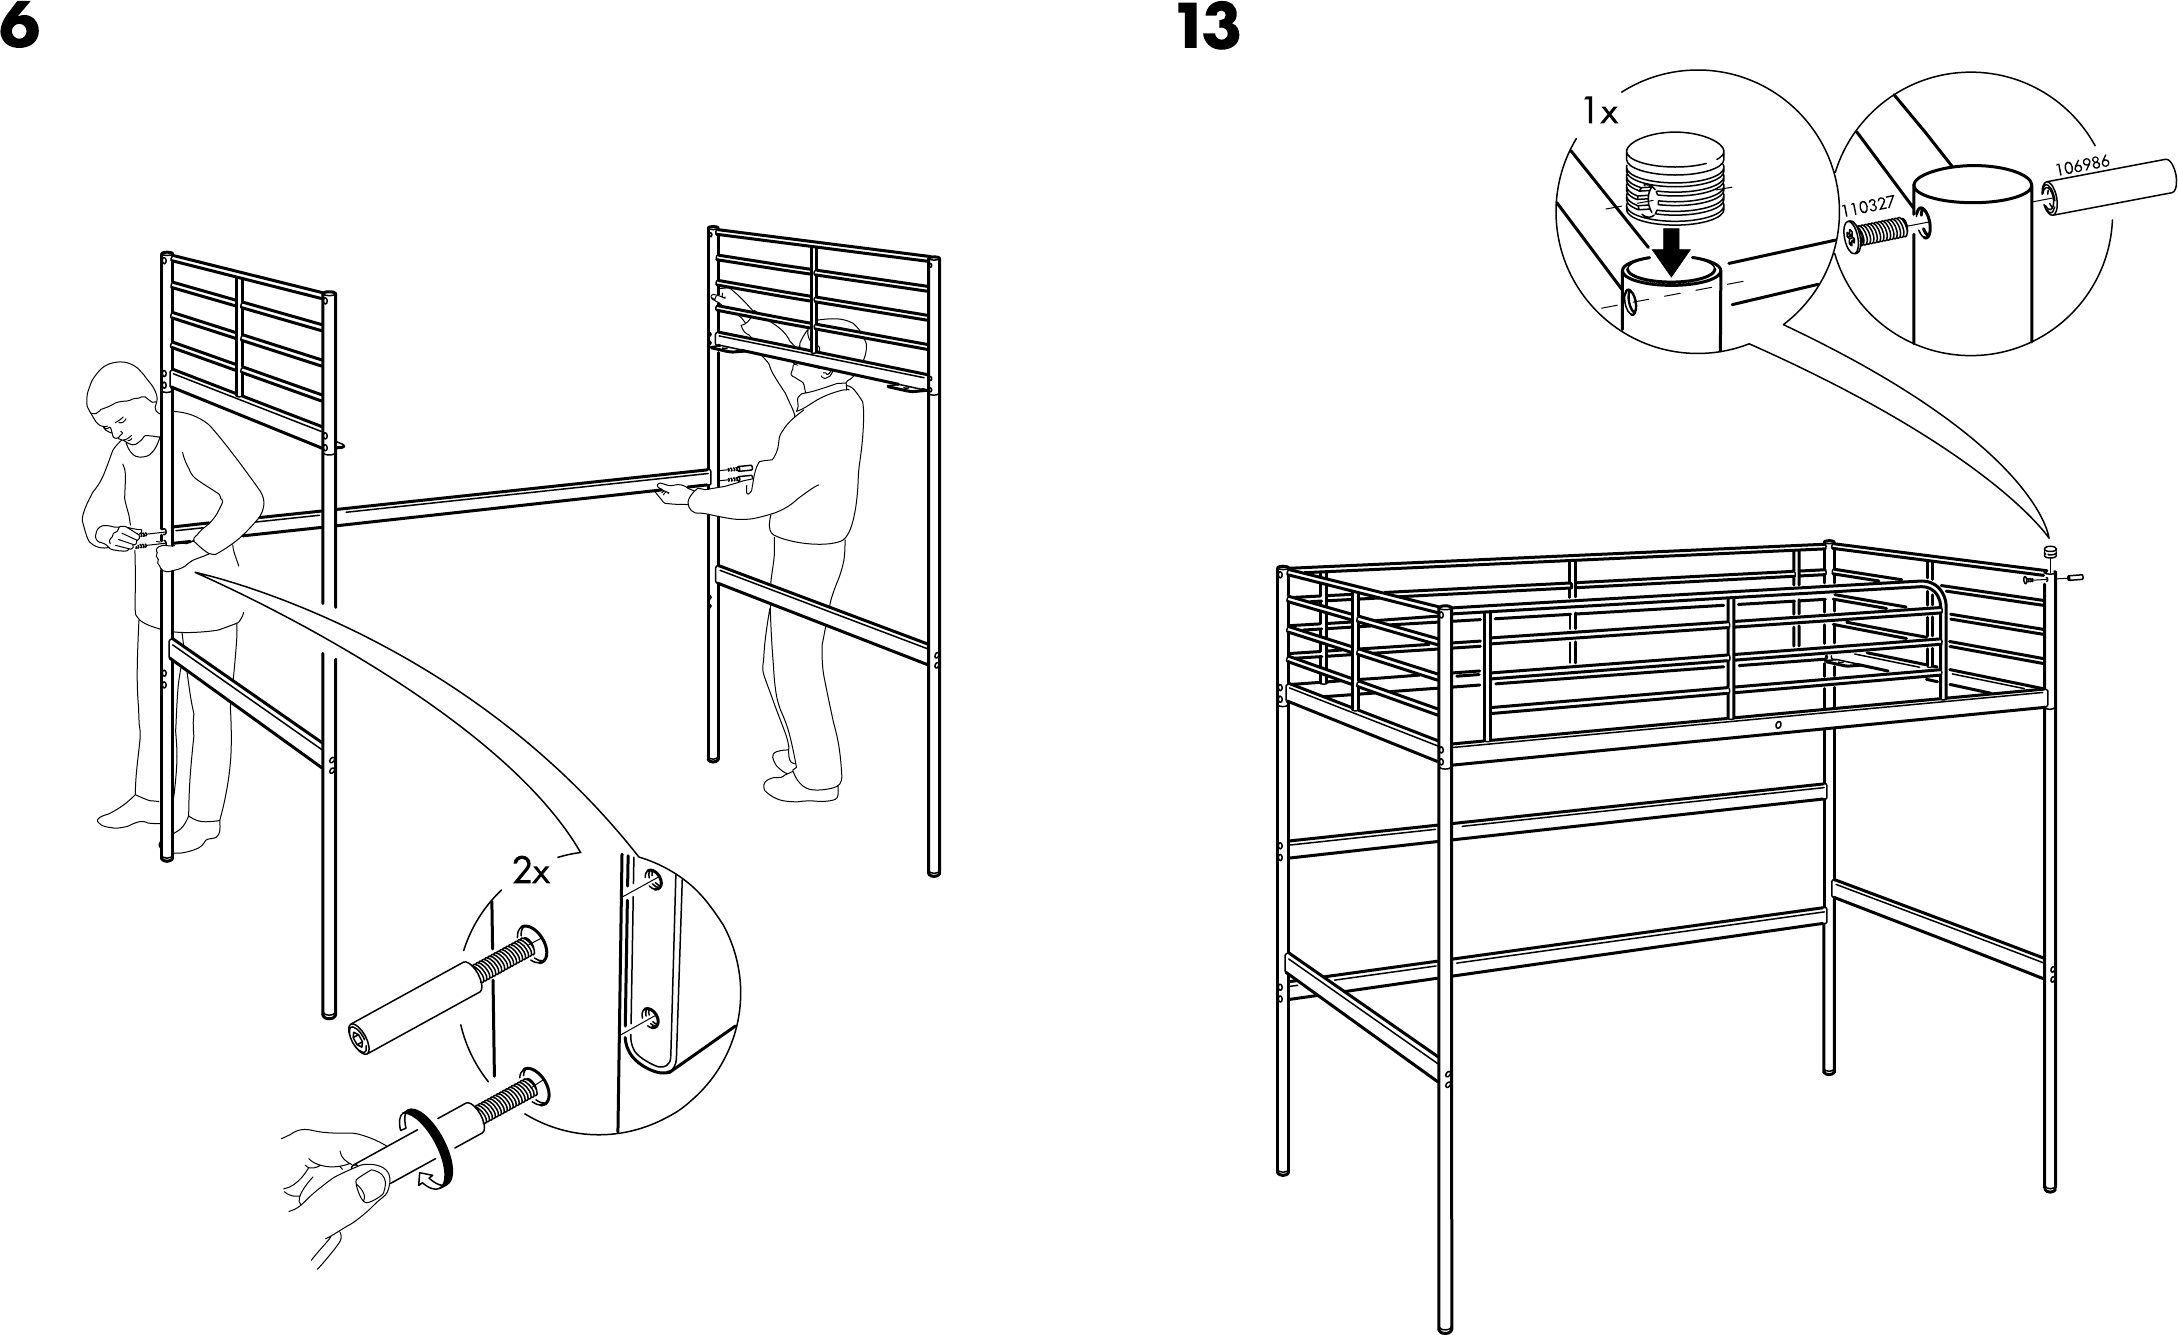 Verrassend Handleiding Ikea Tromso hoogslaper (pagina 7 van 8) (Dansk PP-42